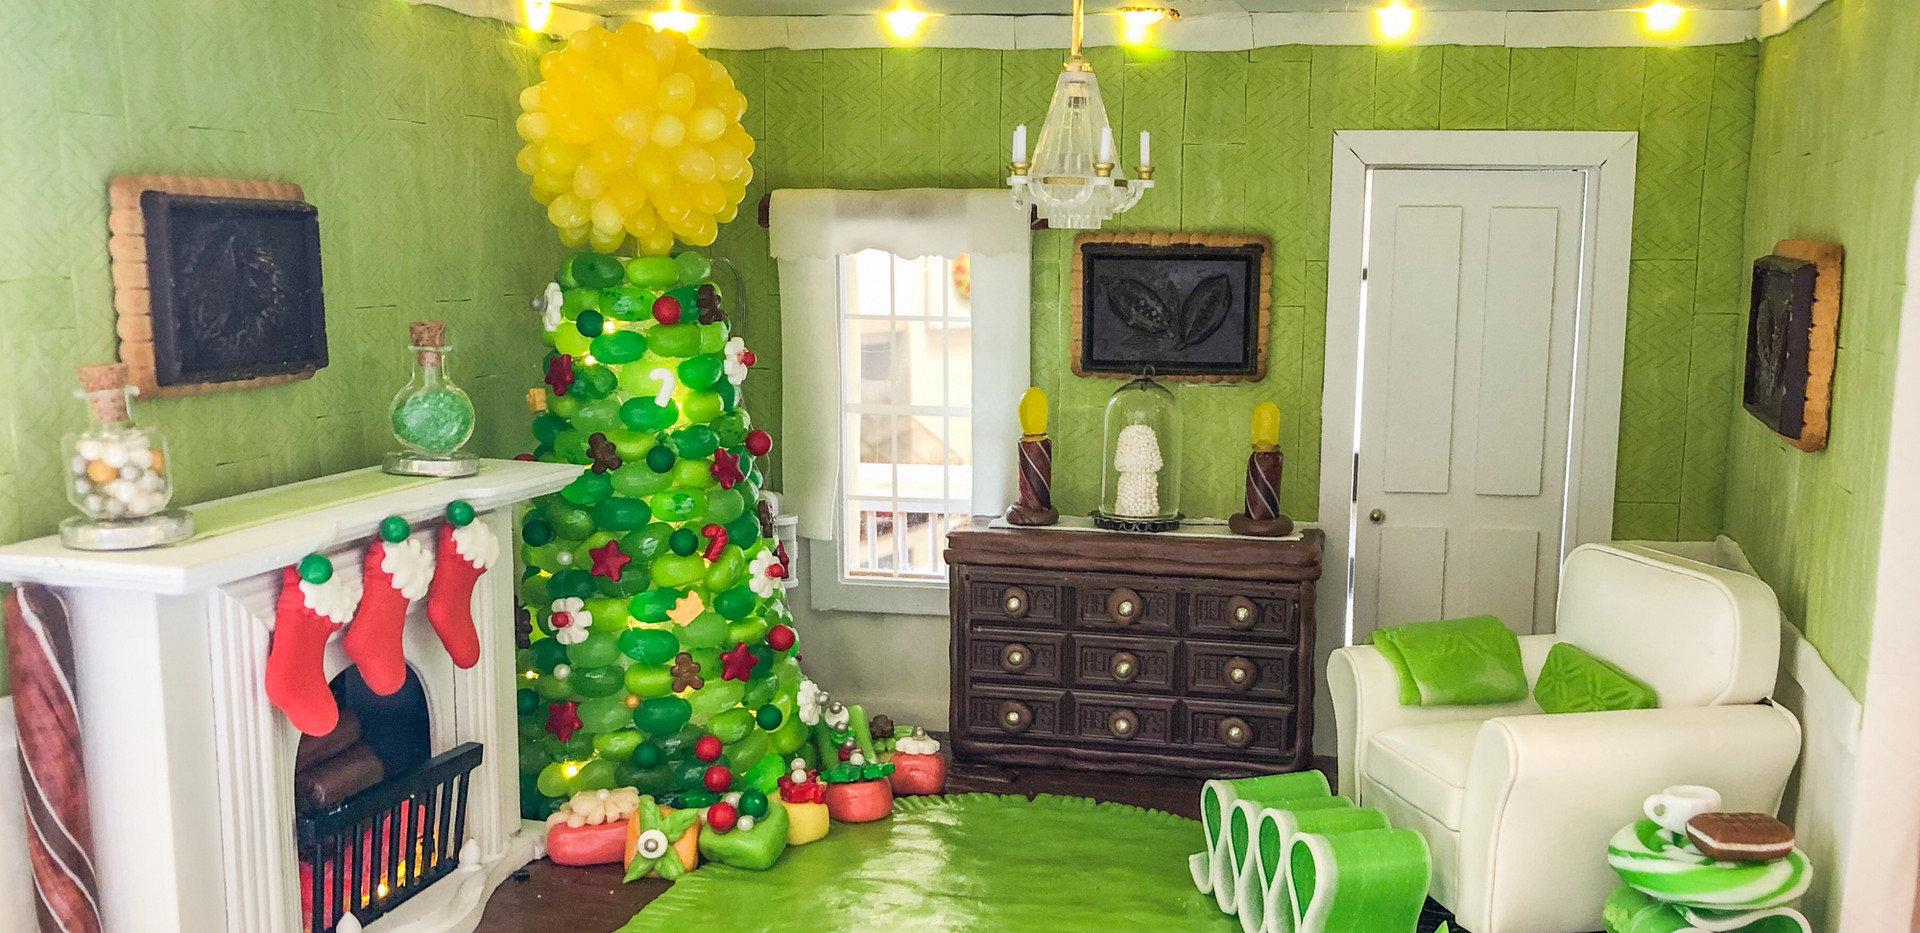 Living Room - Toosie Roll Floor, Gum Walls, Jelly Belly Tree, Chocolate Buffet